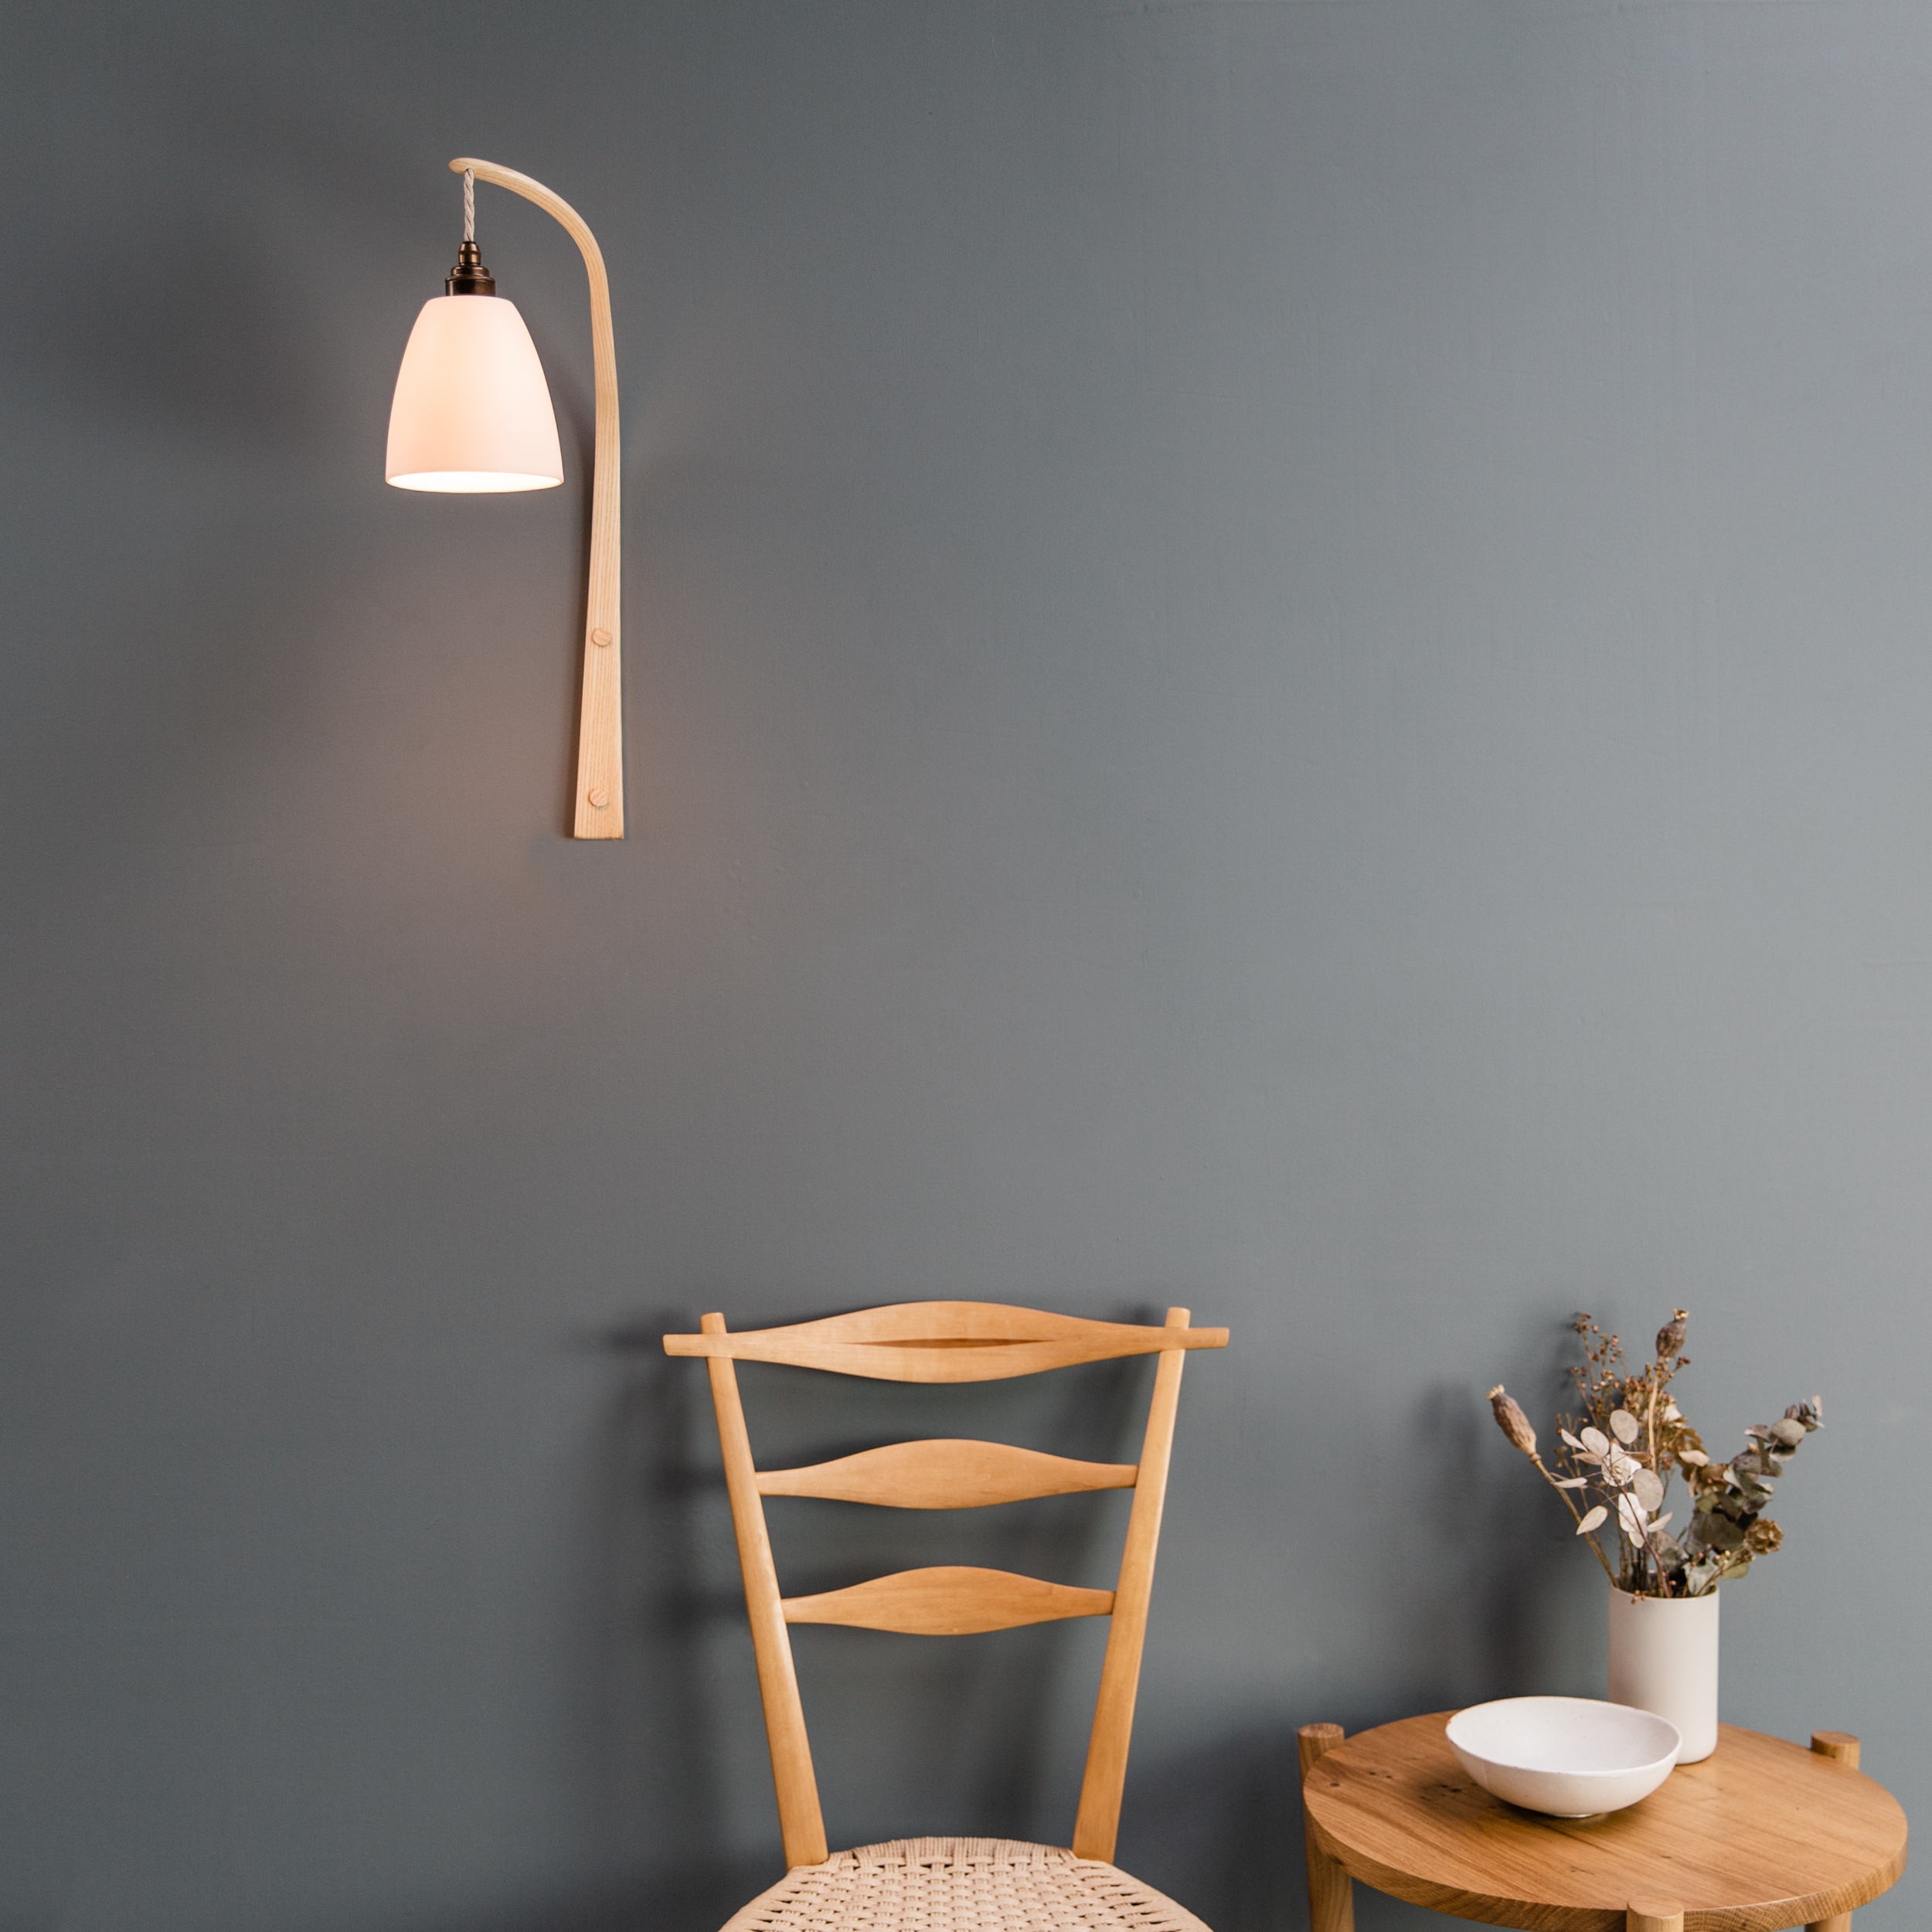 small wall light-3-5WEB SIZE.jpg